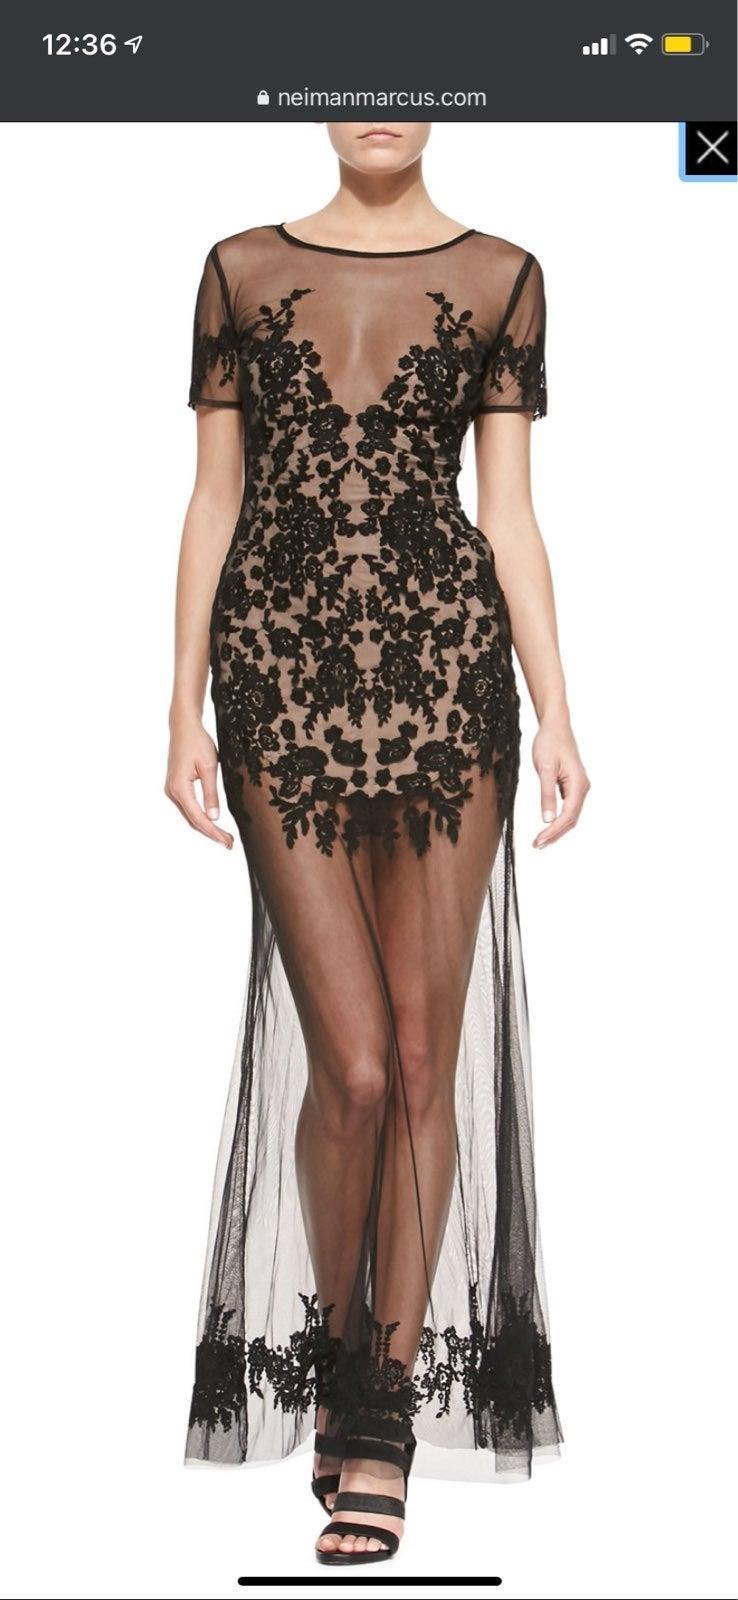 For Love & Lemons Black Luau Maxi Dress